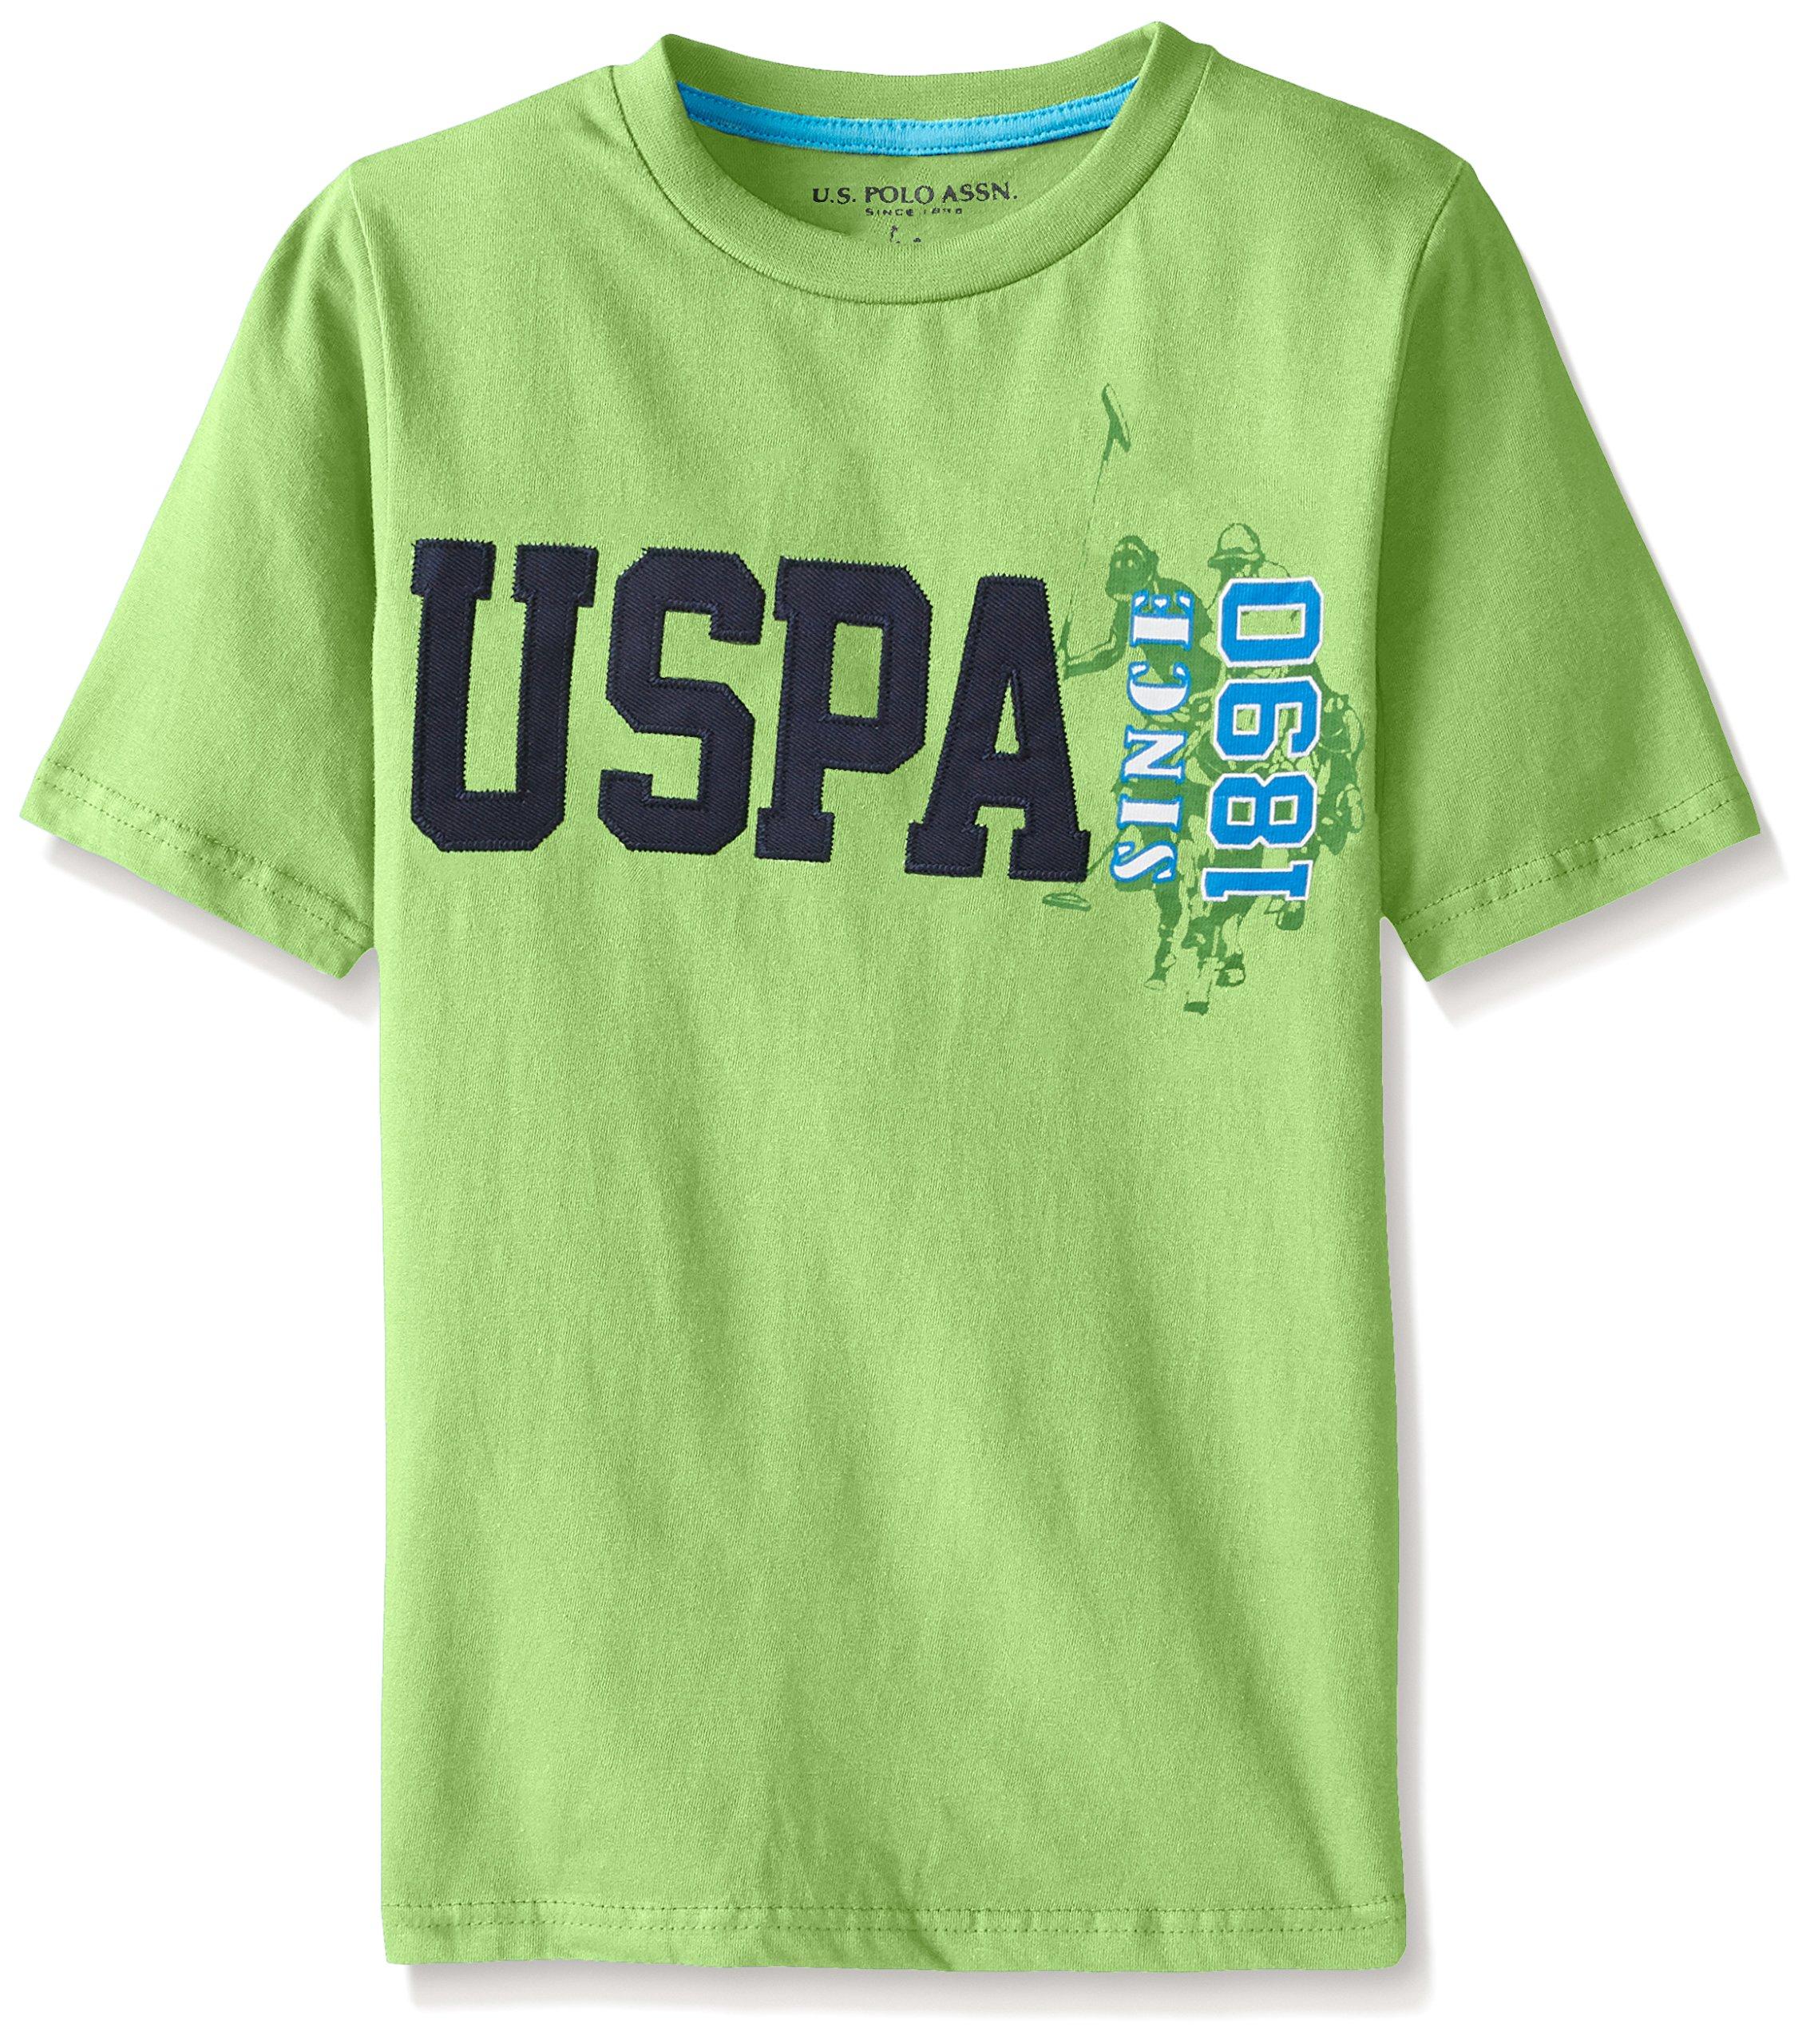 U.S. Polo Assn. Big Boys Cotton Jersey Graphic Crew T-shirt, Summer Lime, 10/12